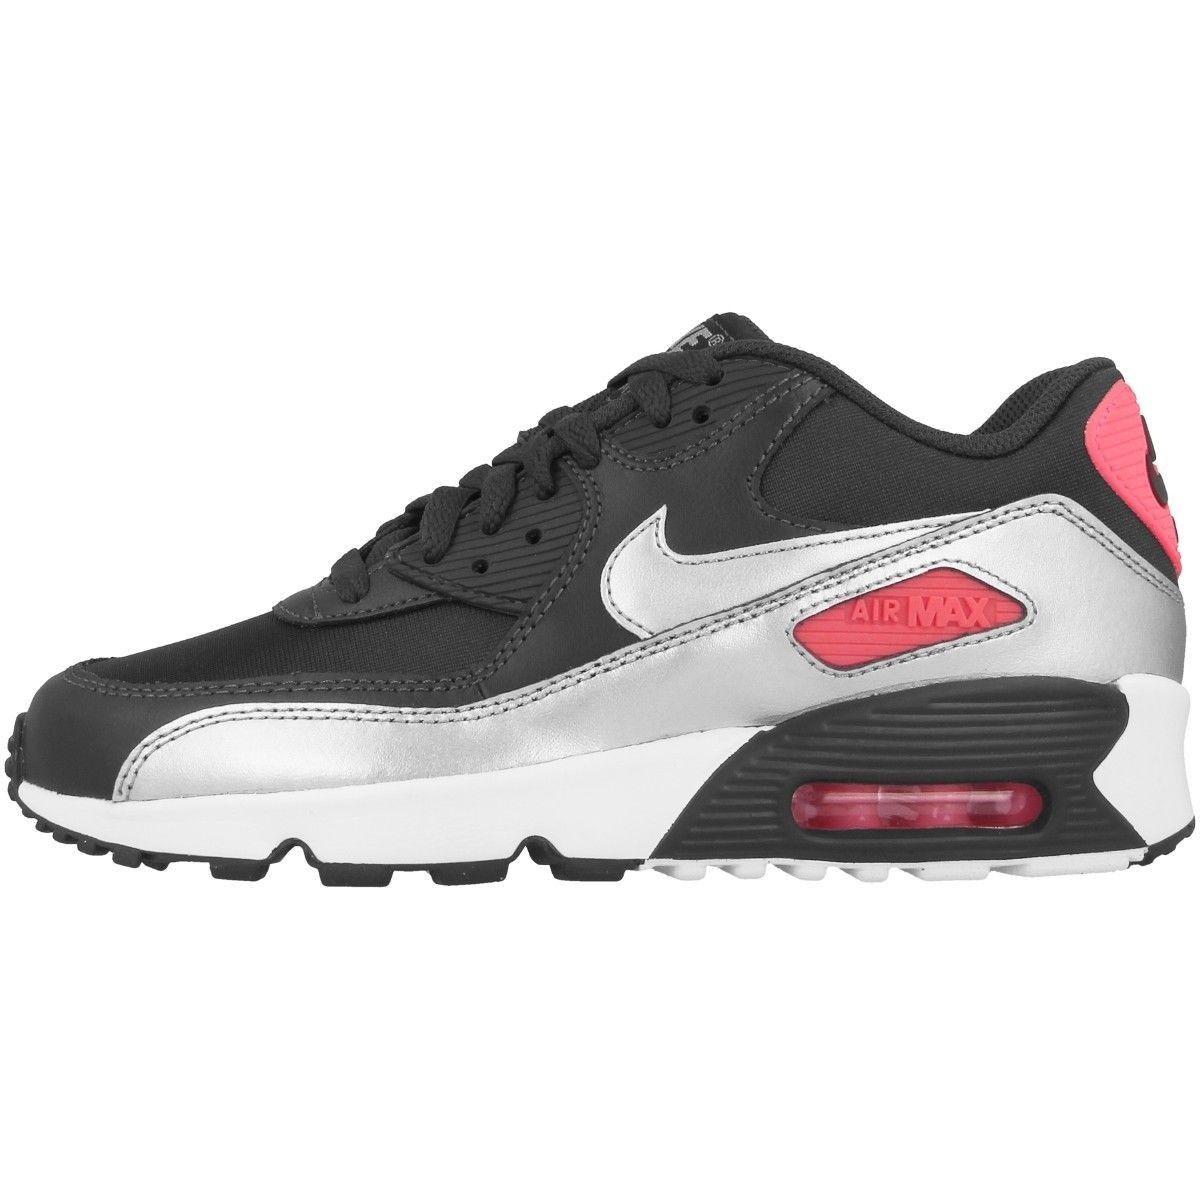 new arrival 63754 29872 Nike Basket Nike Air Max 90 Mesh Junior - 833340-009. Loading zoom